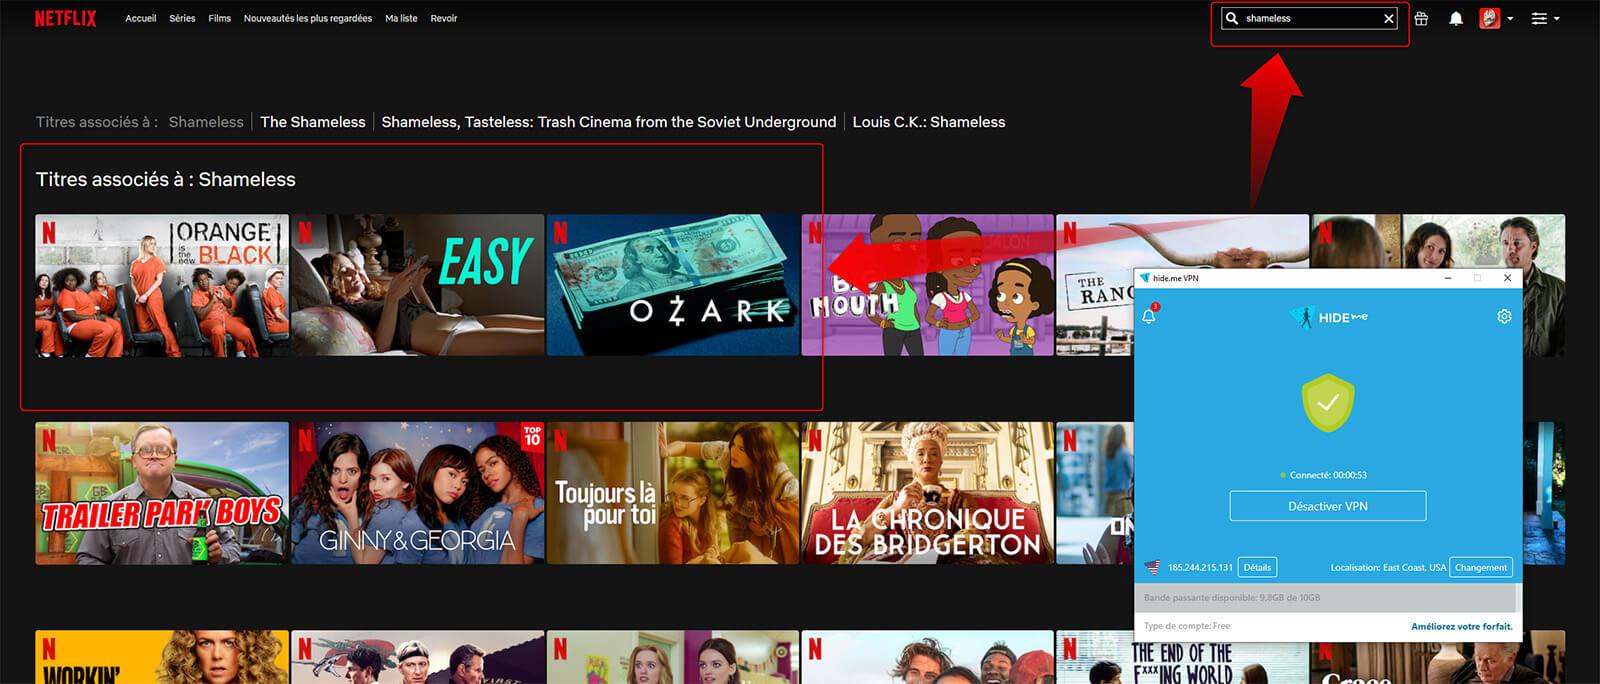 Netflix US Hide me